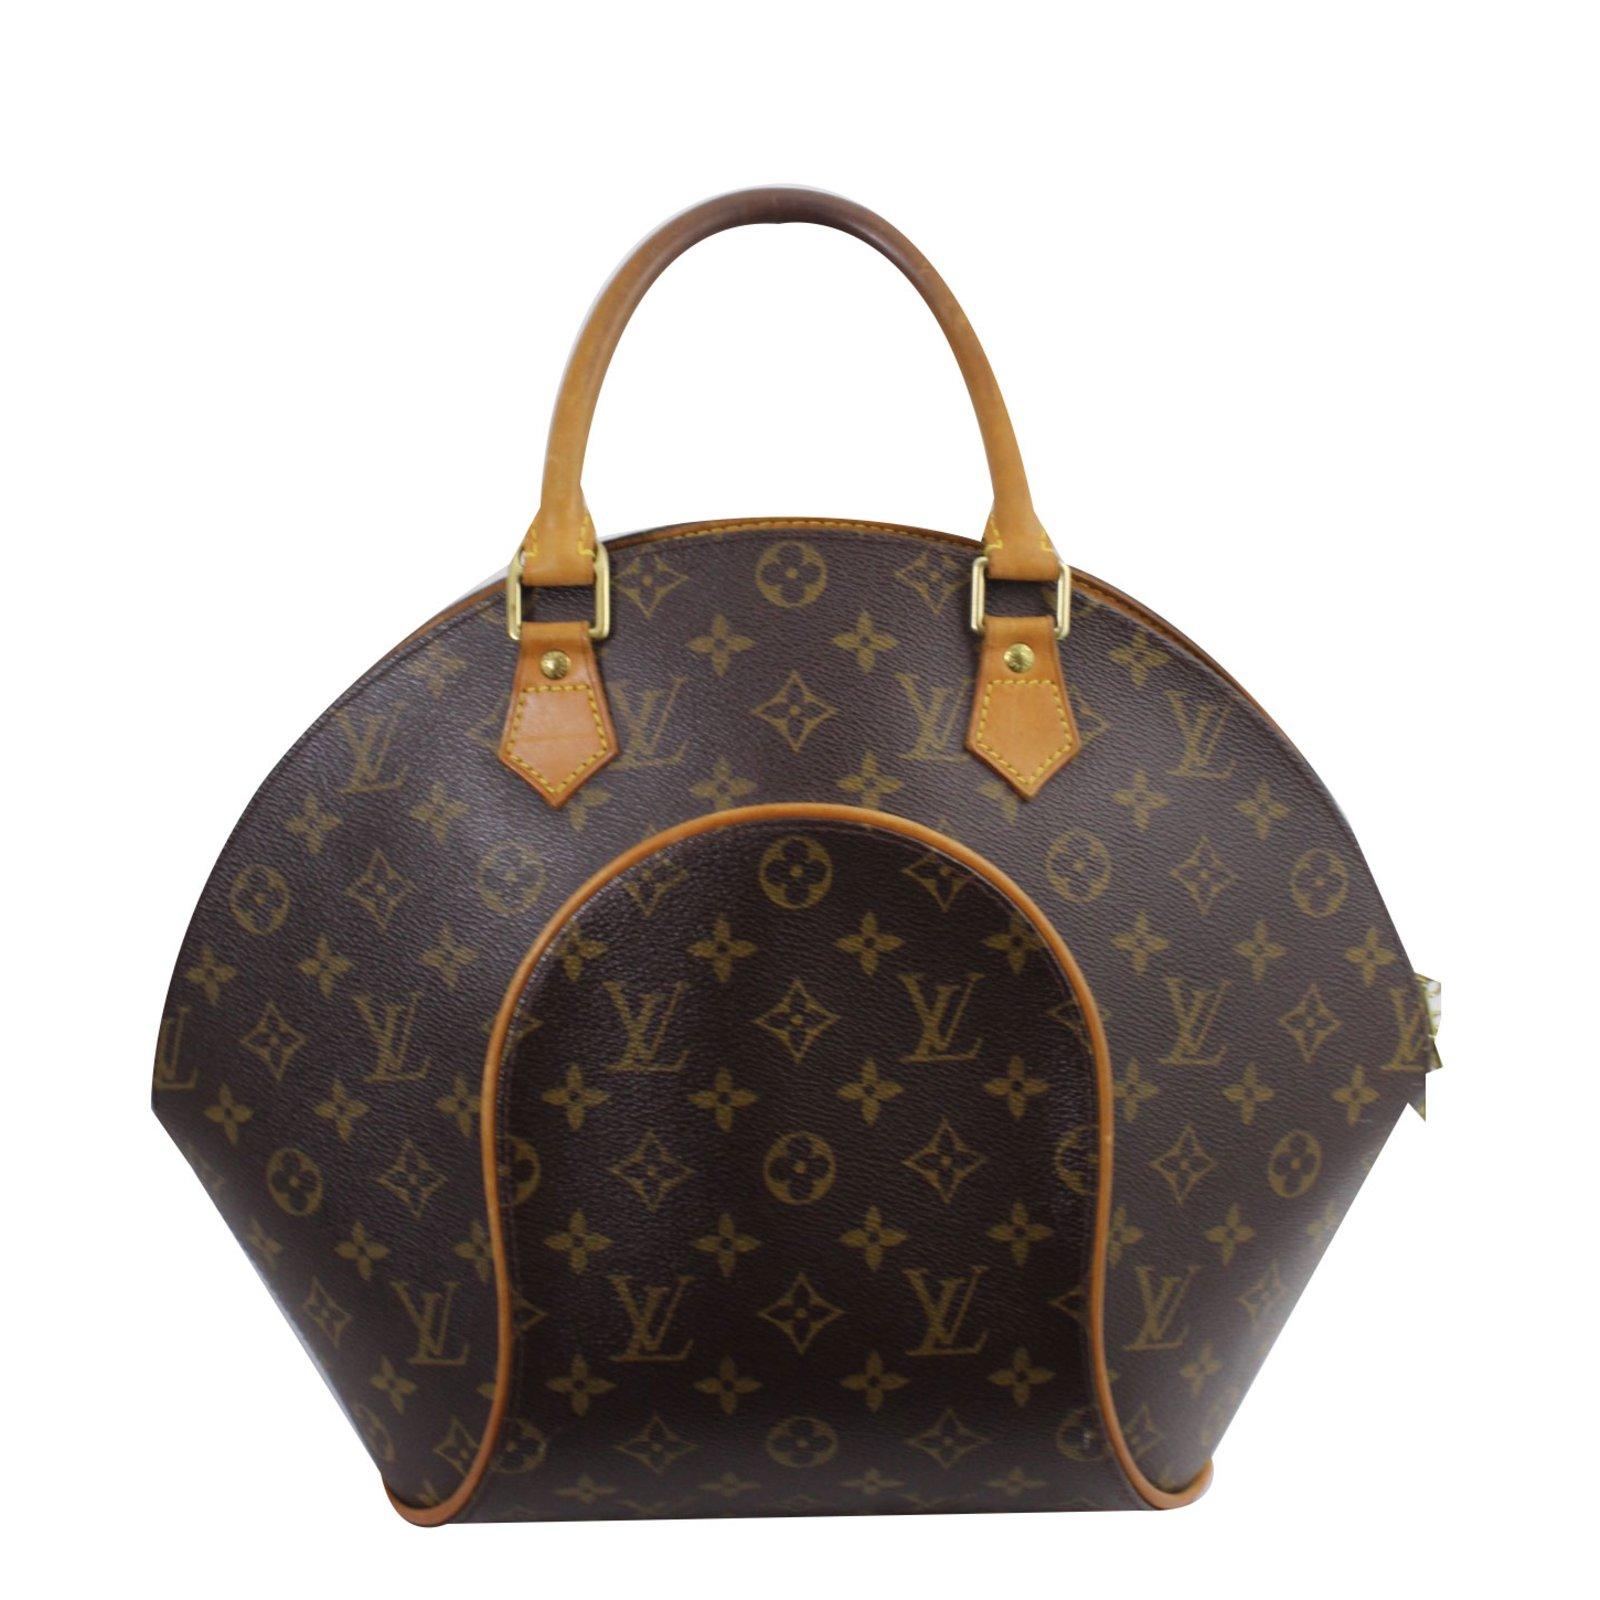 Louis Vuitton Ellipse Gm Handbags Leather Brown Ref 53856